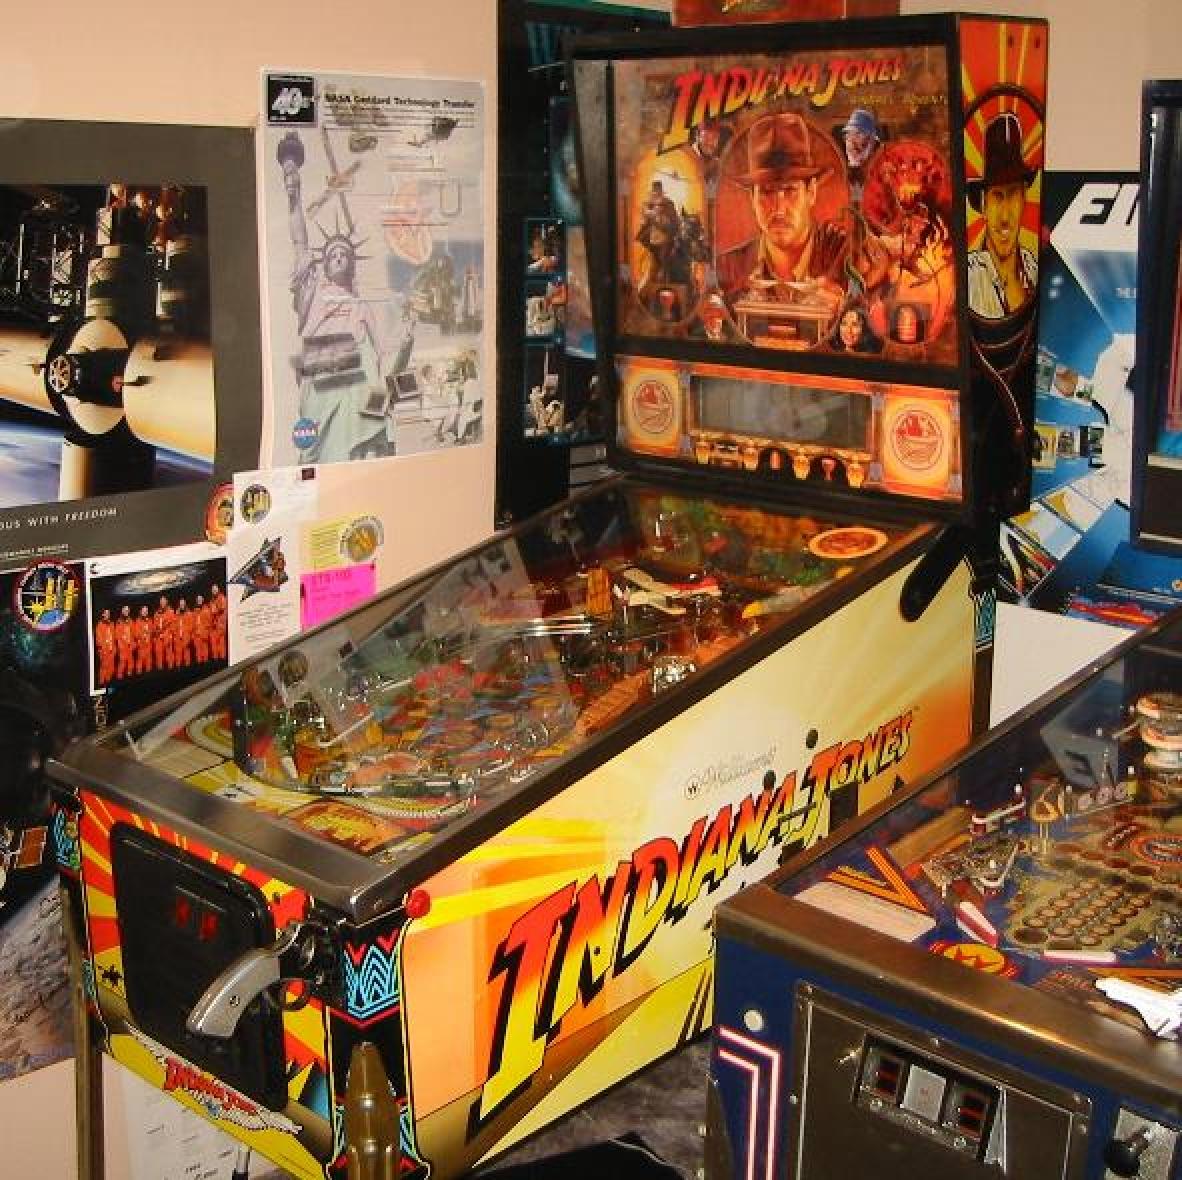 Indiana Jones Pinball Machine Target Decal Set